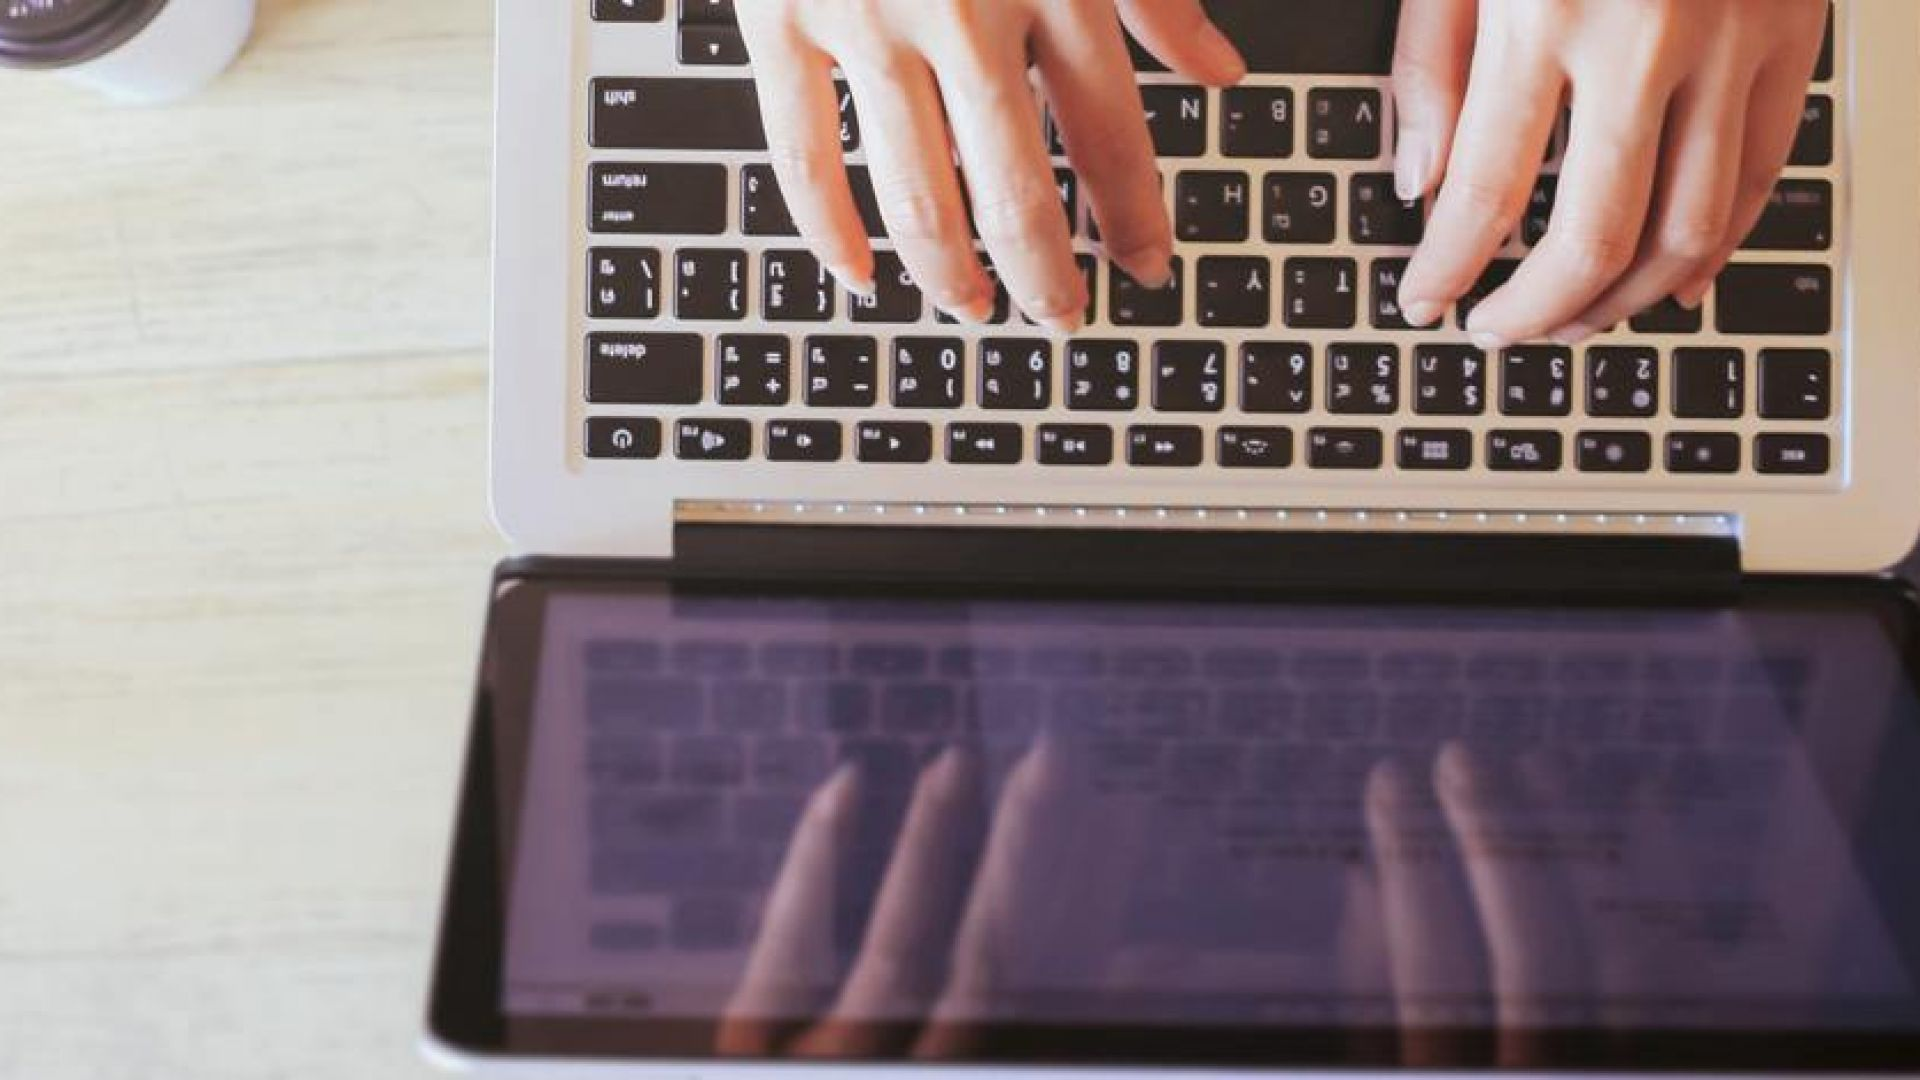 ДСК Директ – как да изградиш свой банков офис у дома